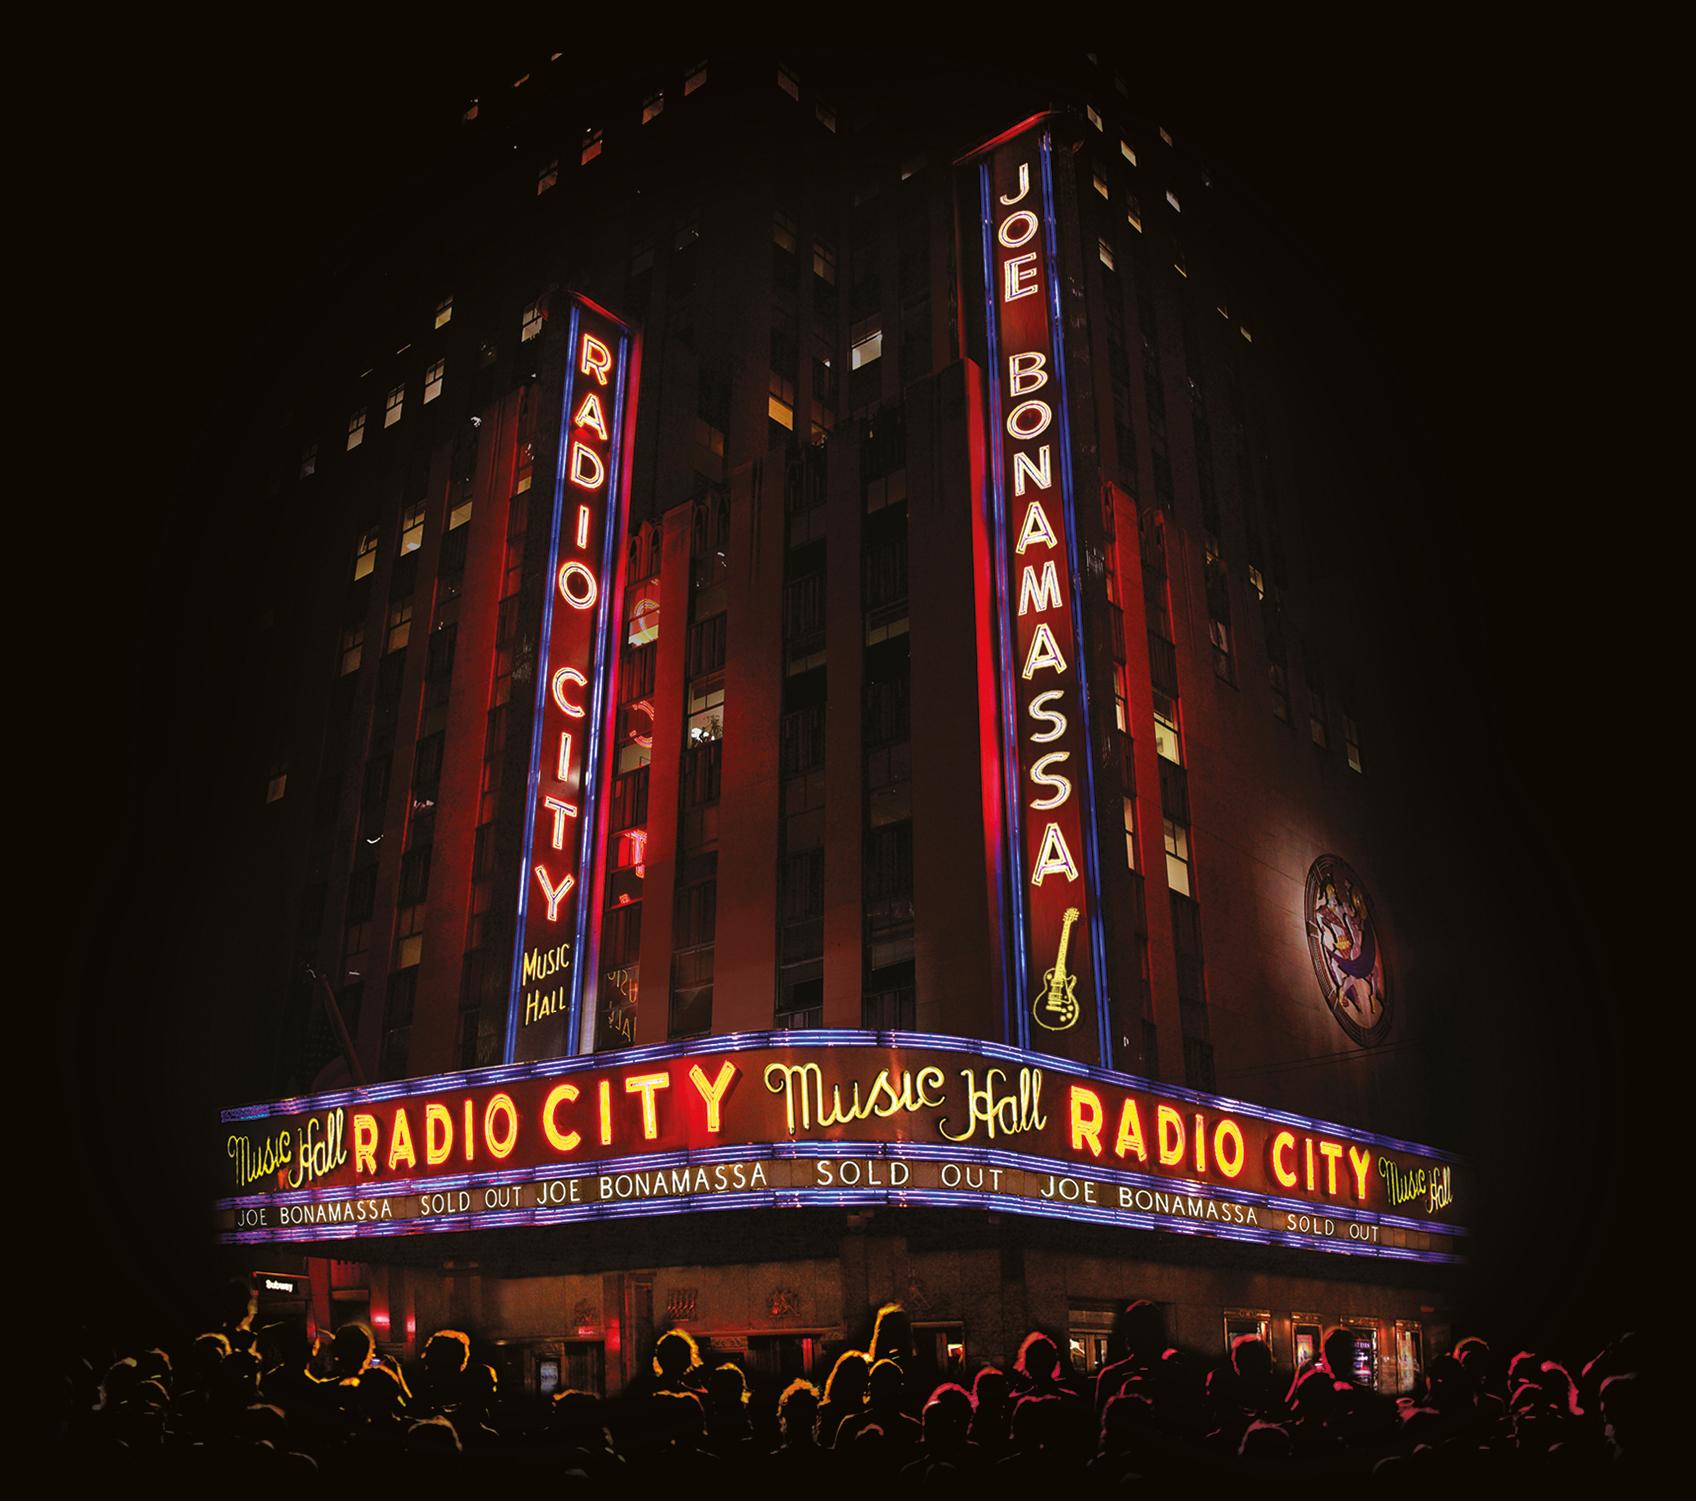 JOE BONAMASSA ISSUES 'TROUBLE TOWN' VIDEO